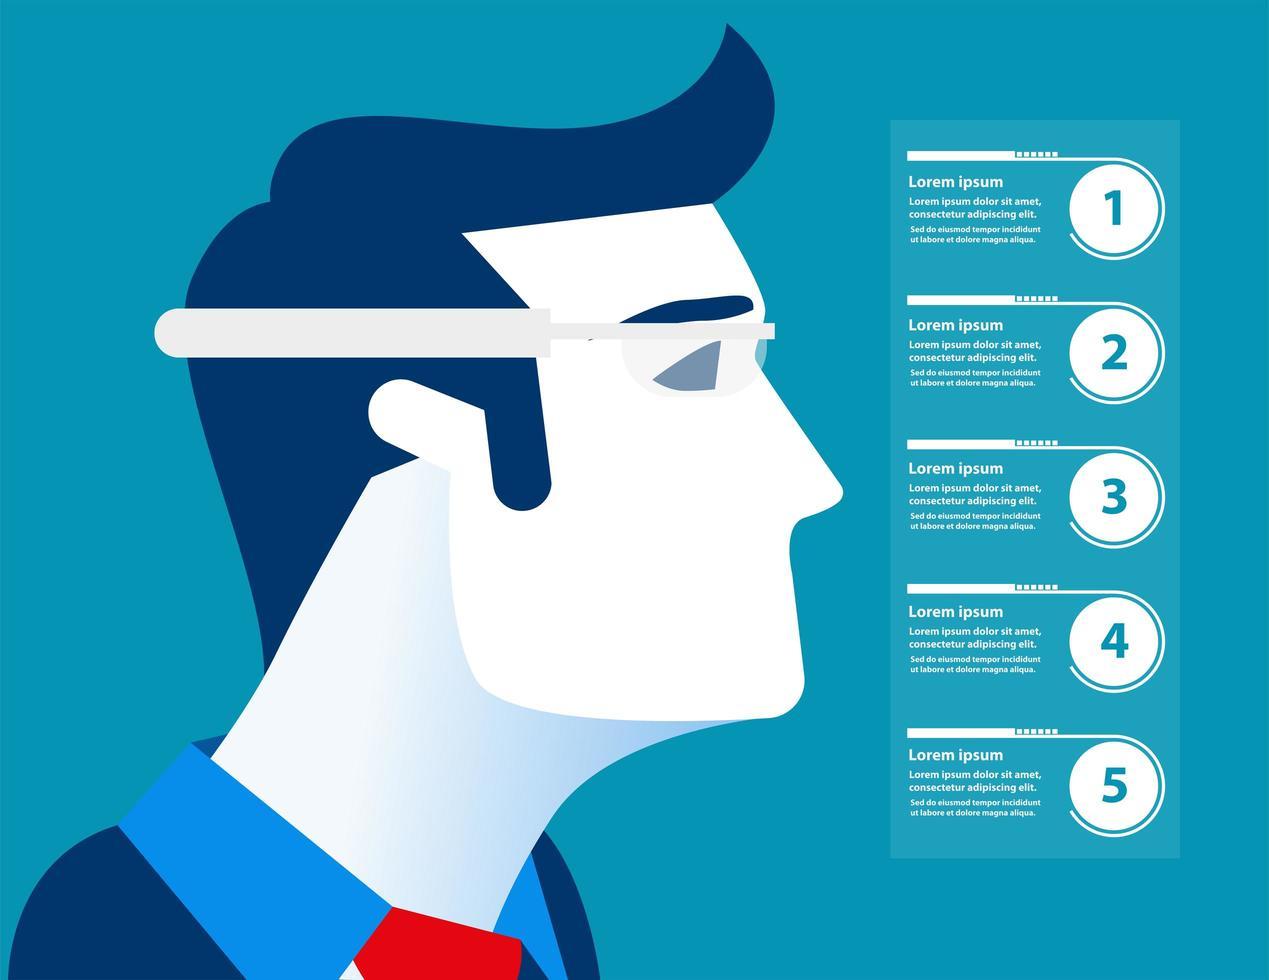 zakenman met futuristische glazen infographic vector